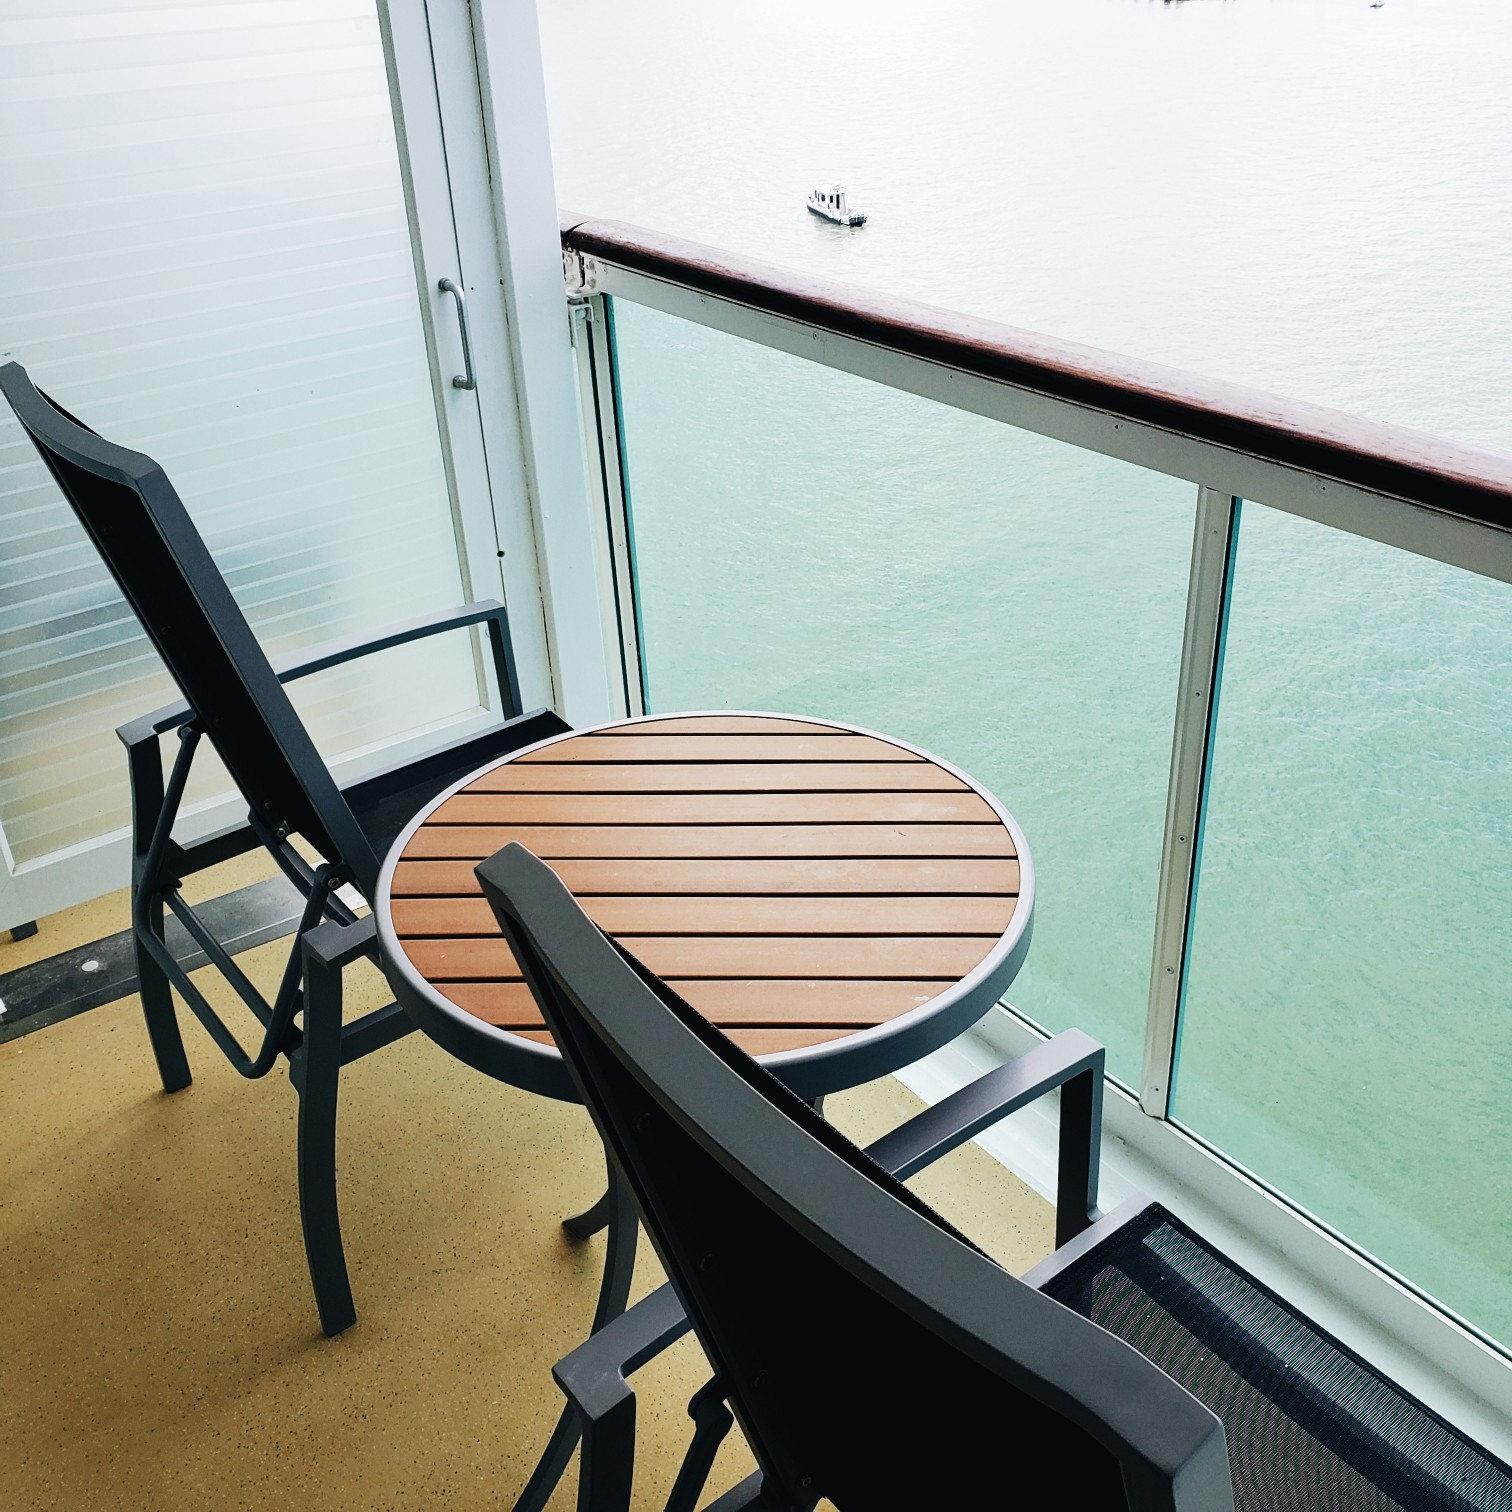 Royal Caribbean Mariner of the Seas Balcony View of the Ocean